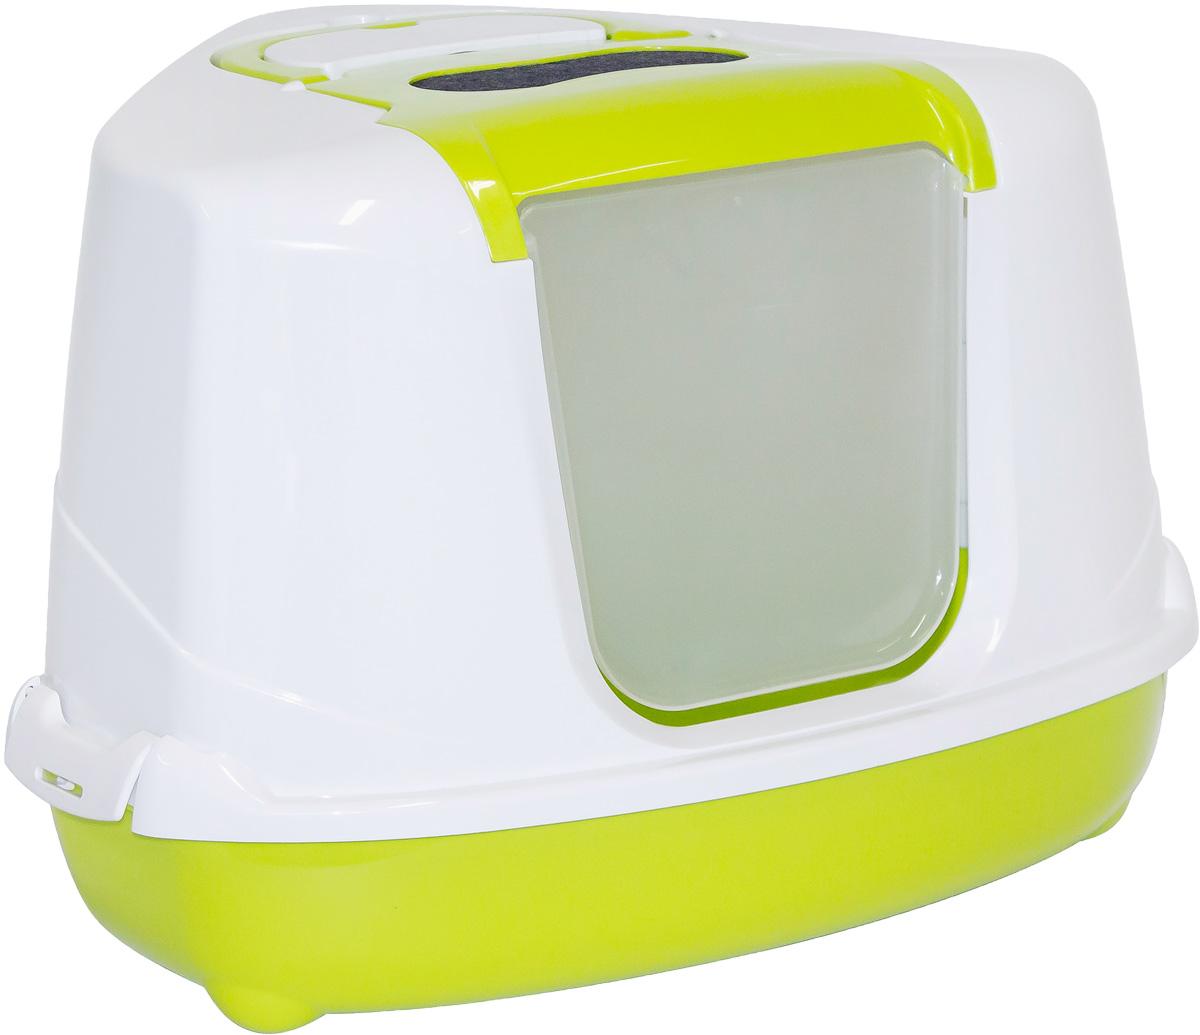 Туалет угловой закрытый для кошек Moderna Flip Corner, цвет: зеленый, 56х45х39 см14C250173